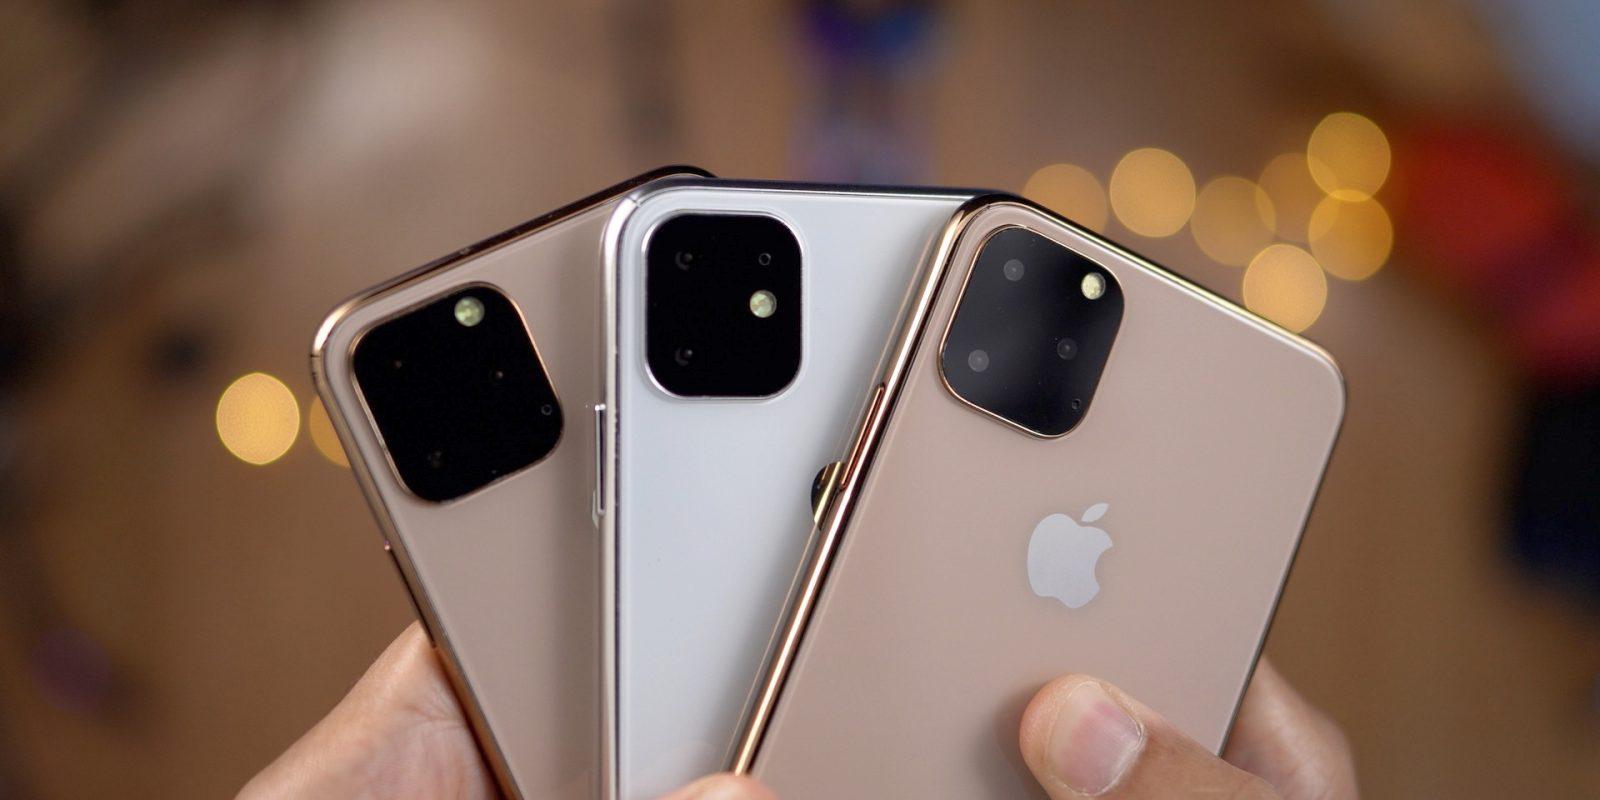 iPhone - شركة ESR لتصنيع أغطية جوالات آيفون تتوقع أسماء الجوالات الجديدة لهذا العام